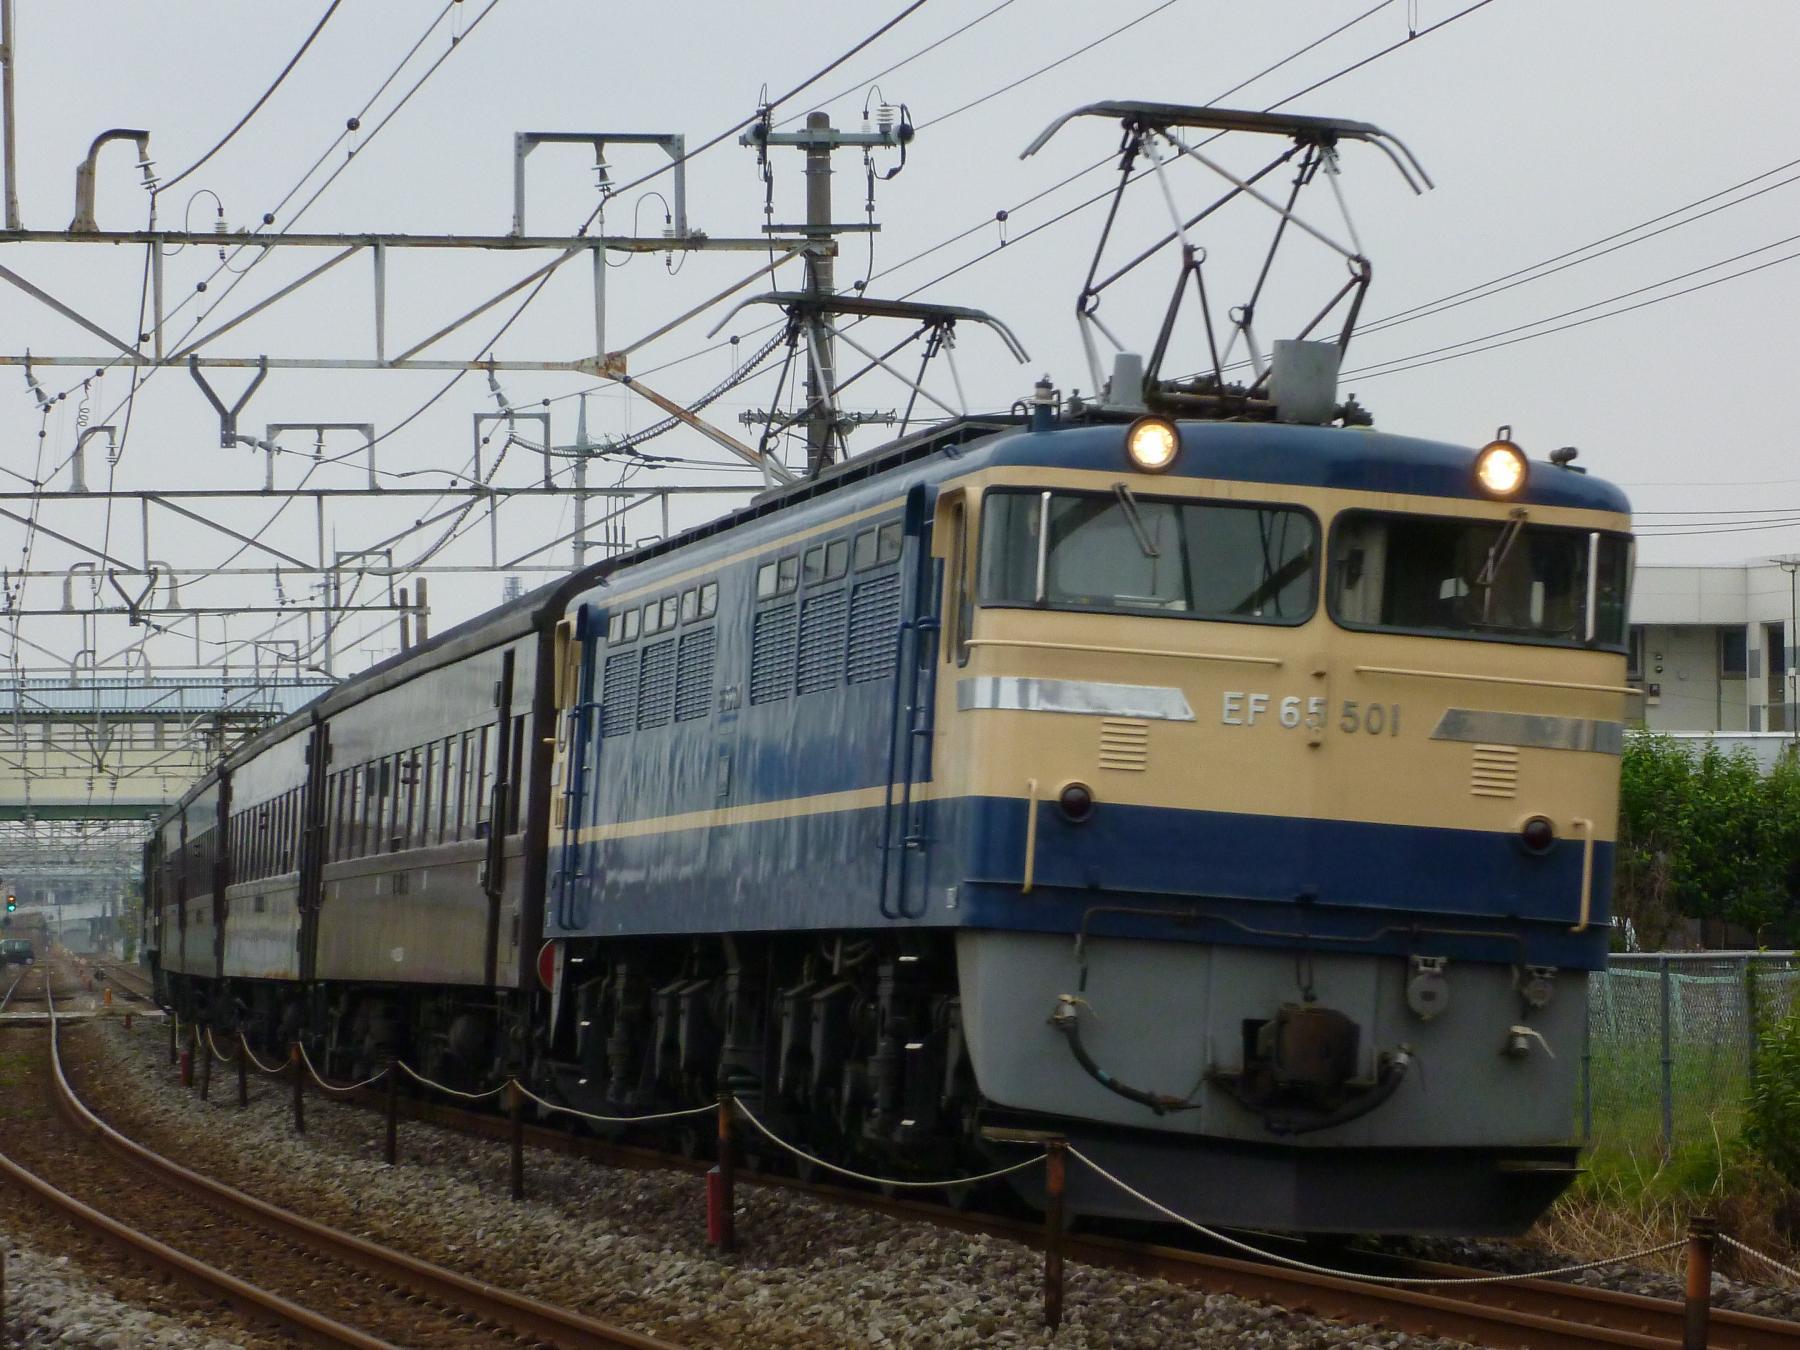 P1140881_convert_20110528104230.jpg